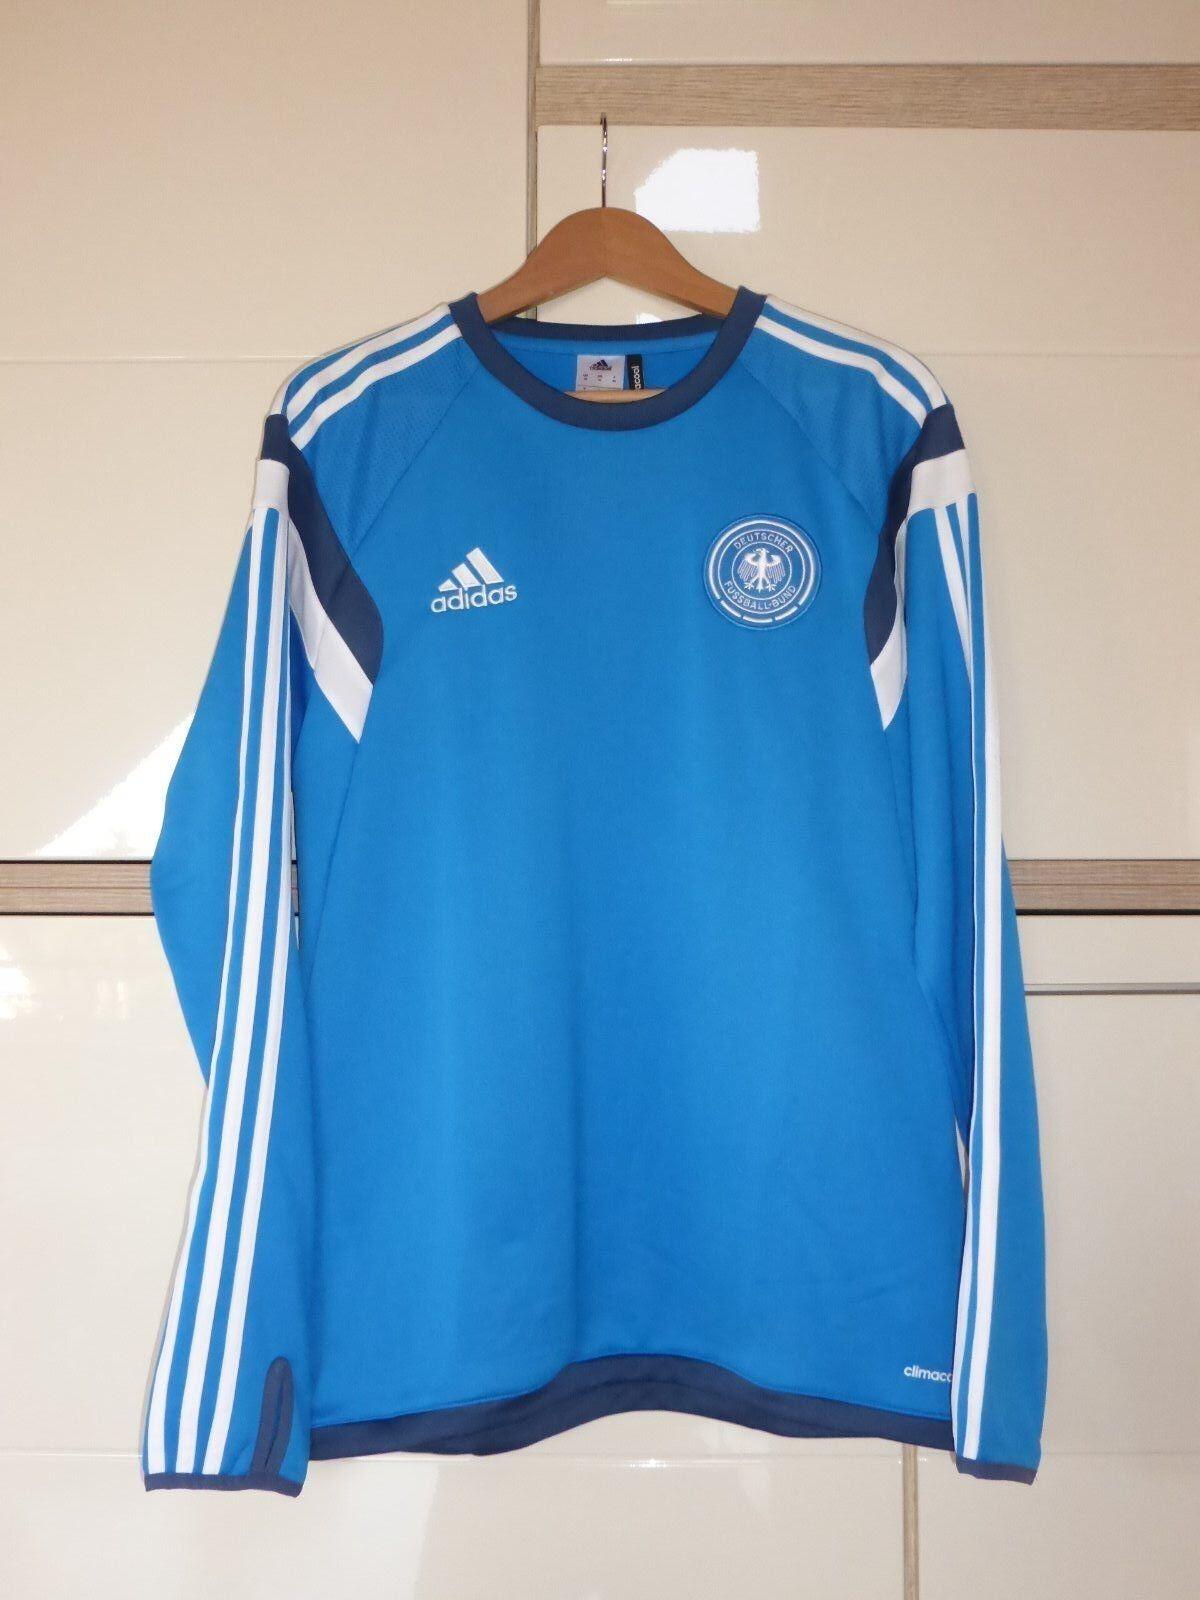 Adidas DFB Deutschland Training Shirt blau 2014 2014 2014 Germany Größe XS - Mercedes Benz 93fea5